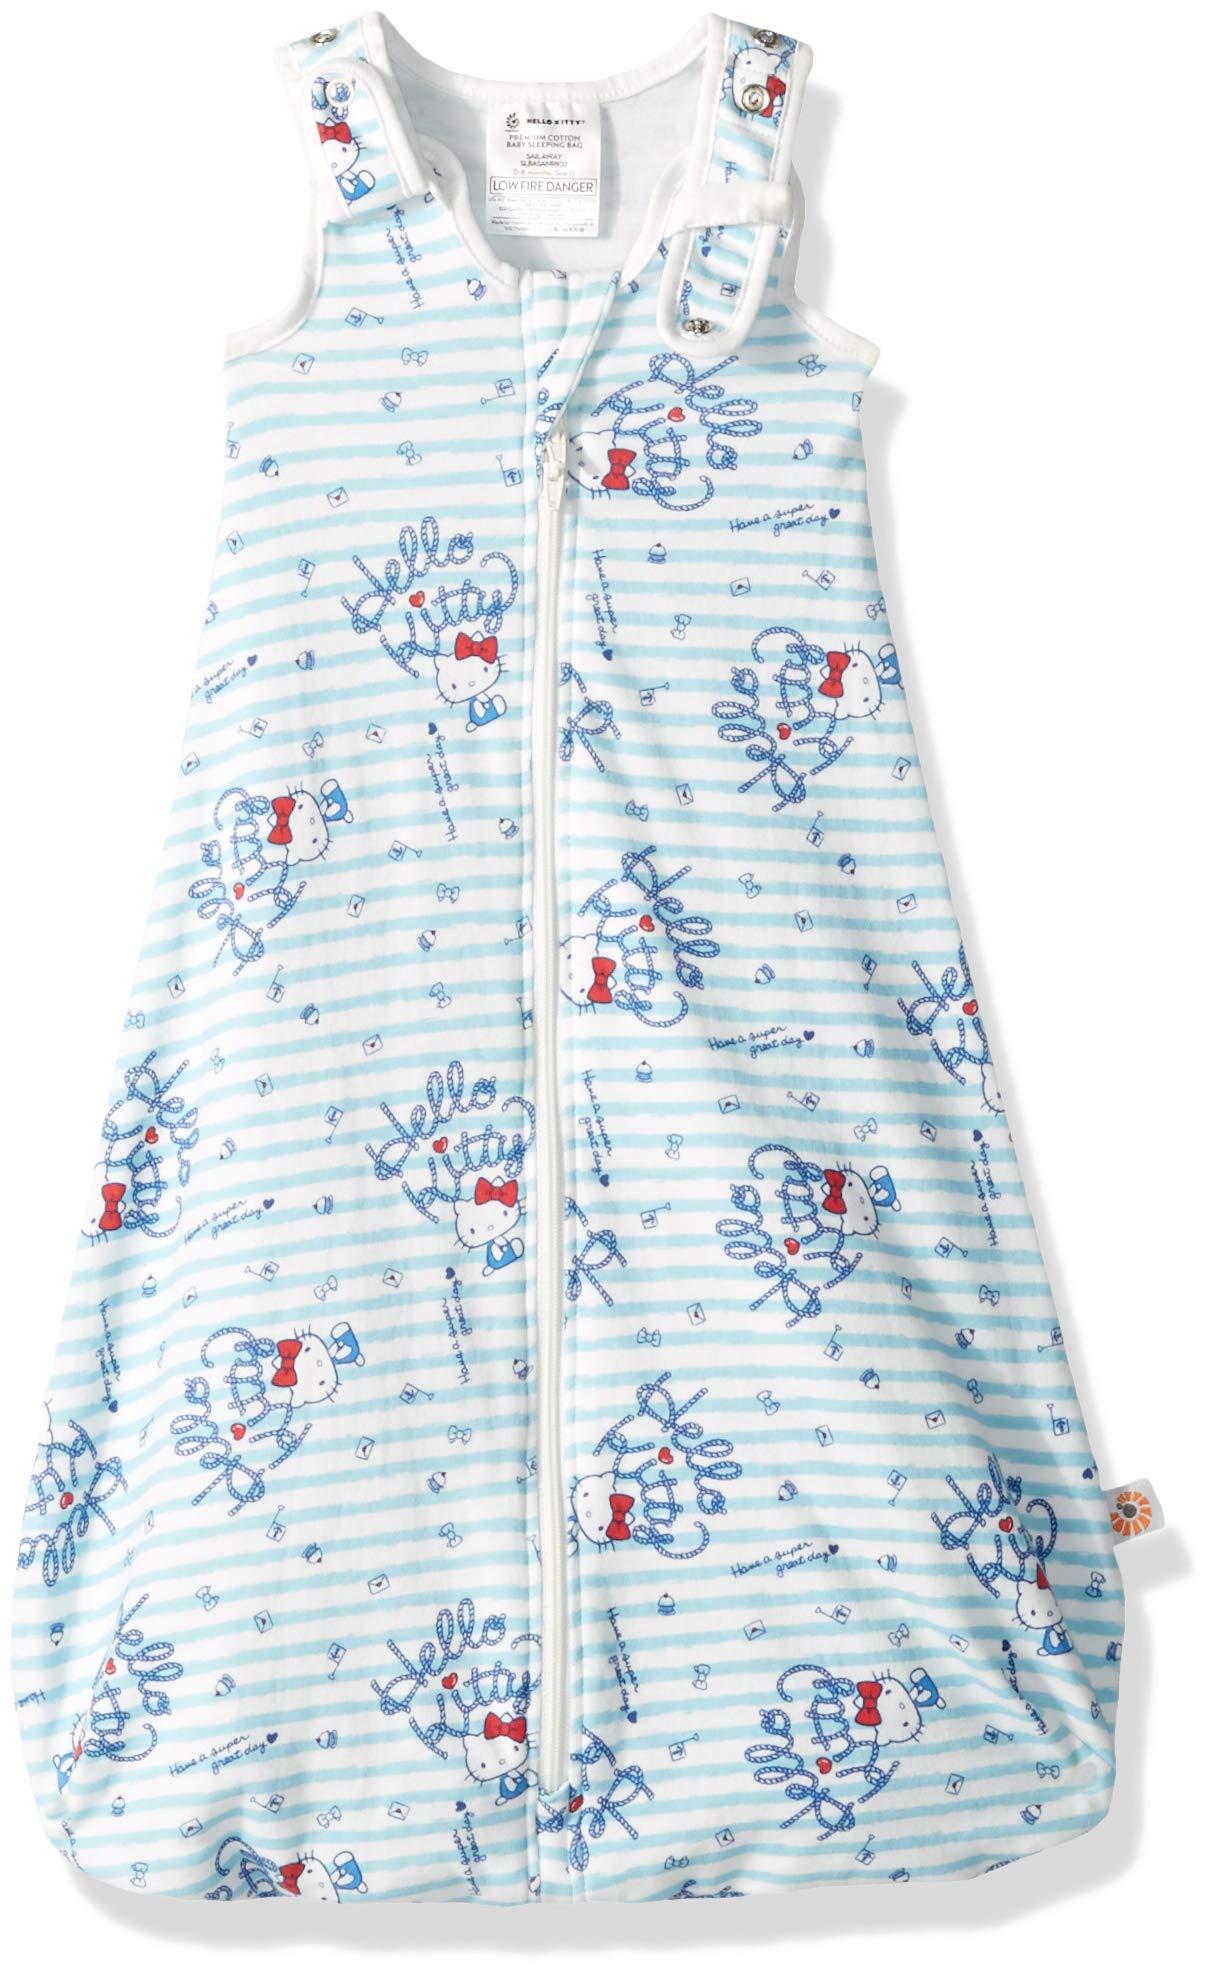 Ergobaby Premium Cotton Sleep Bag, Sail Away, Blue, 0-6 Months